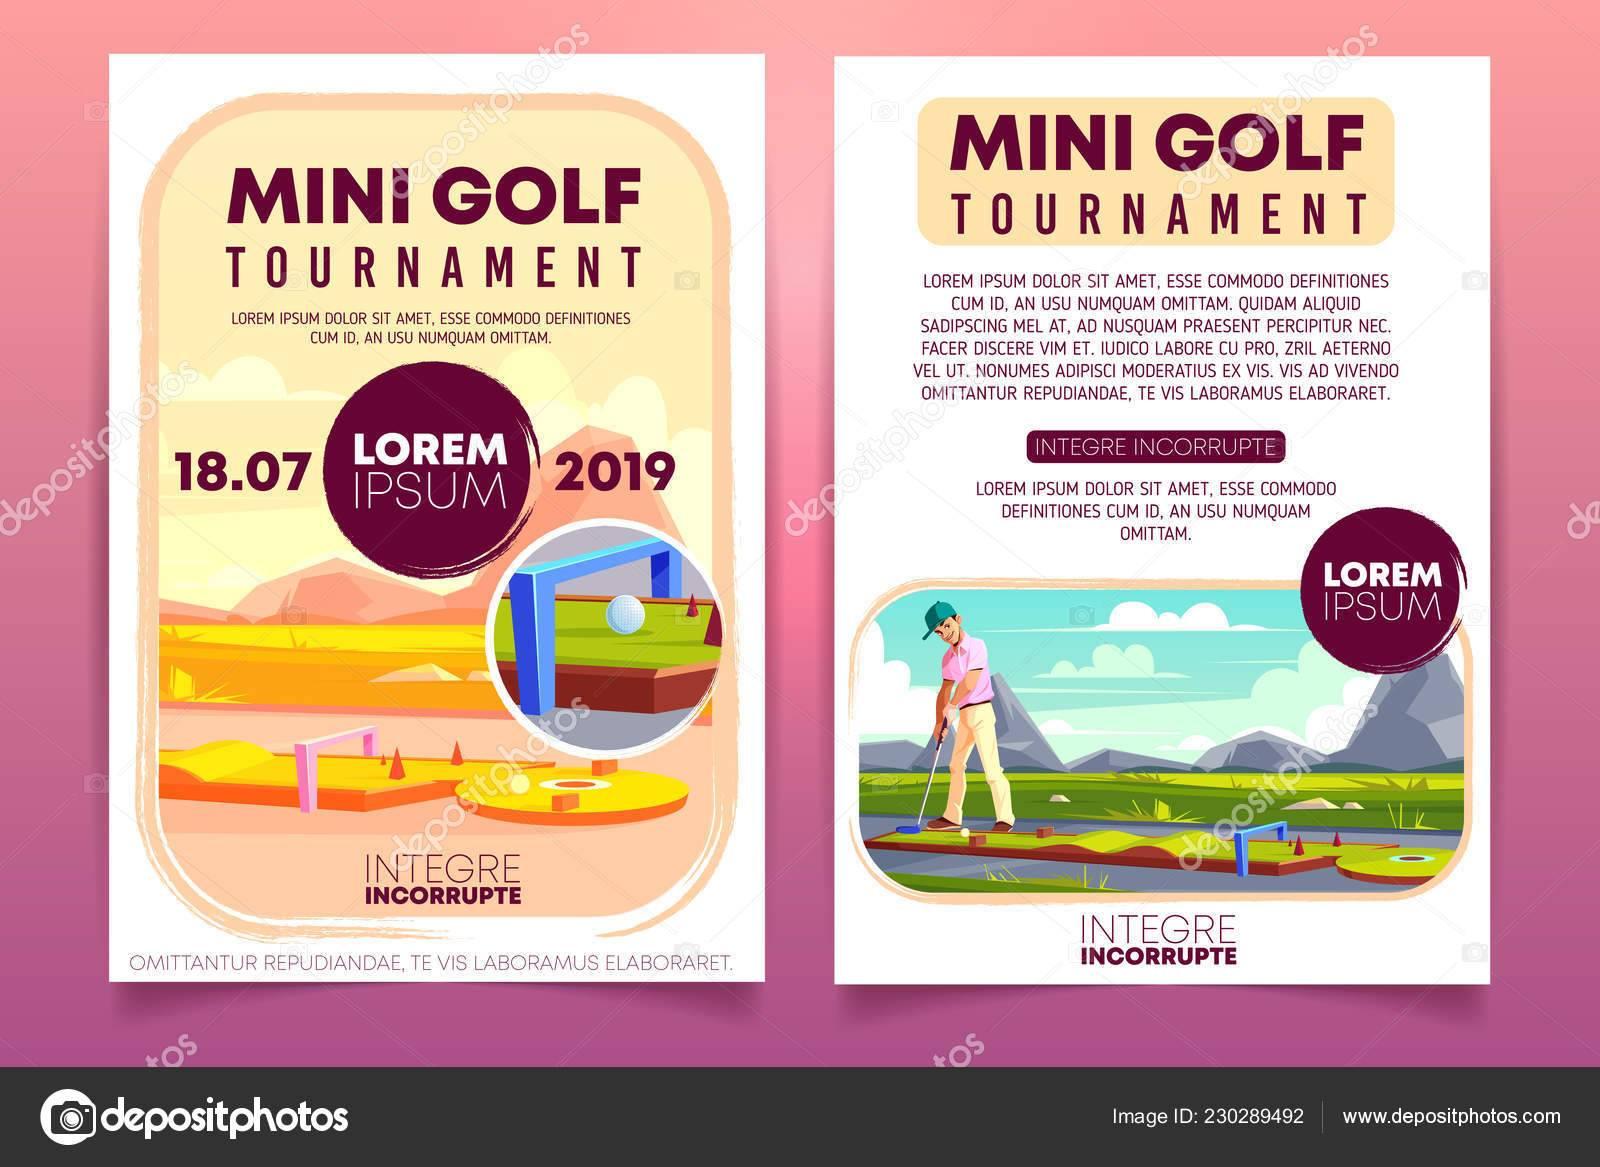 Mini Golf Tournament Flyer Template